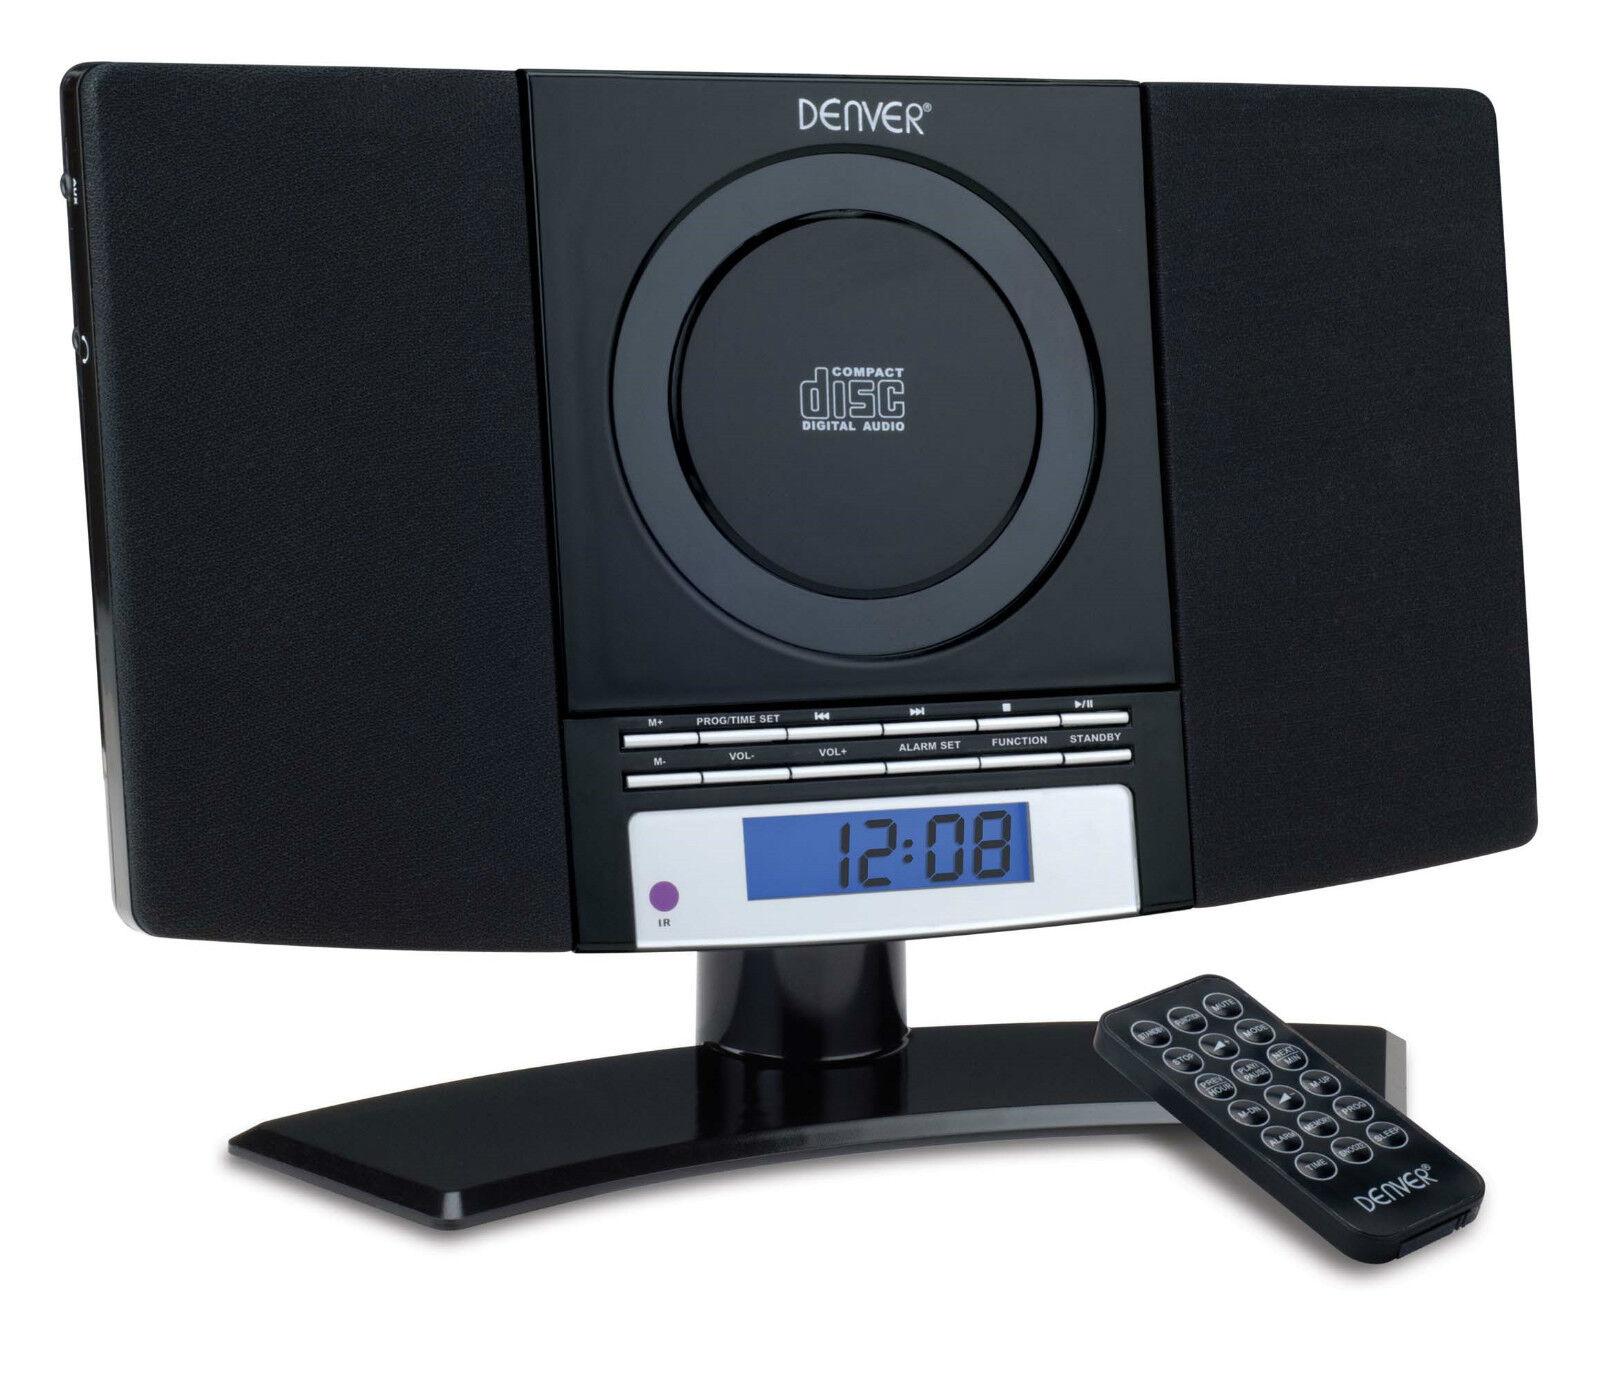 Cd Player Denver Mc 5220 Black Music System Mini Micro